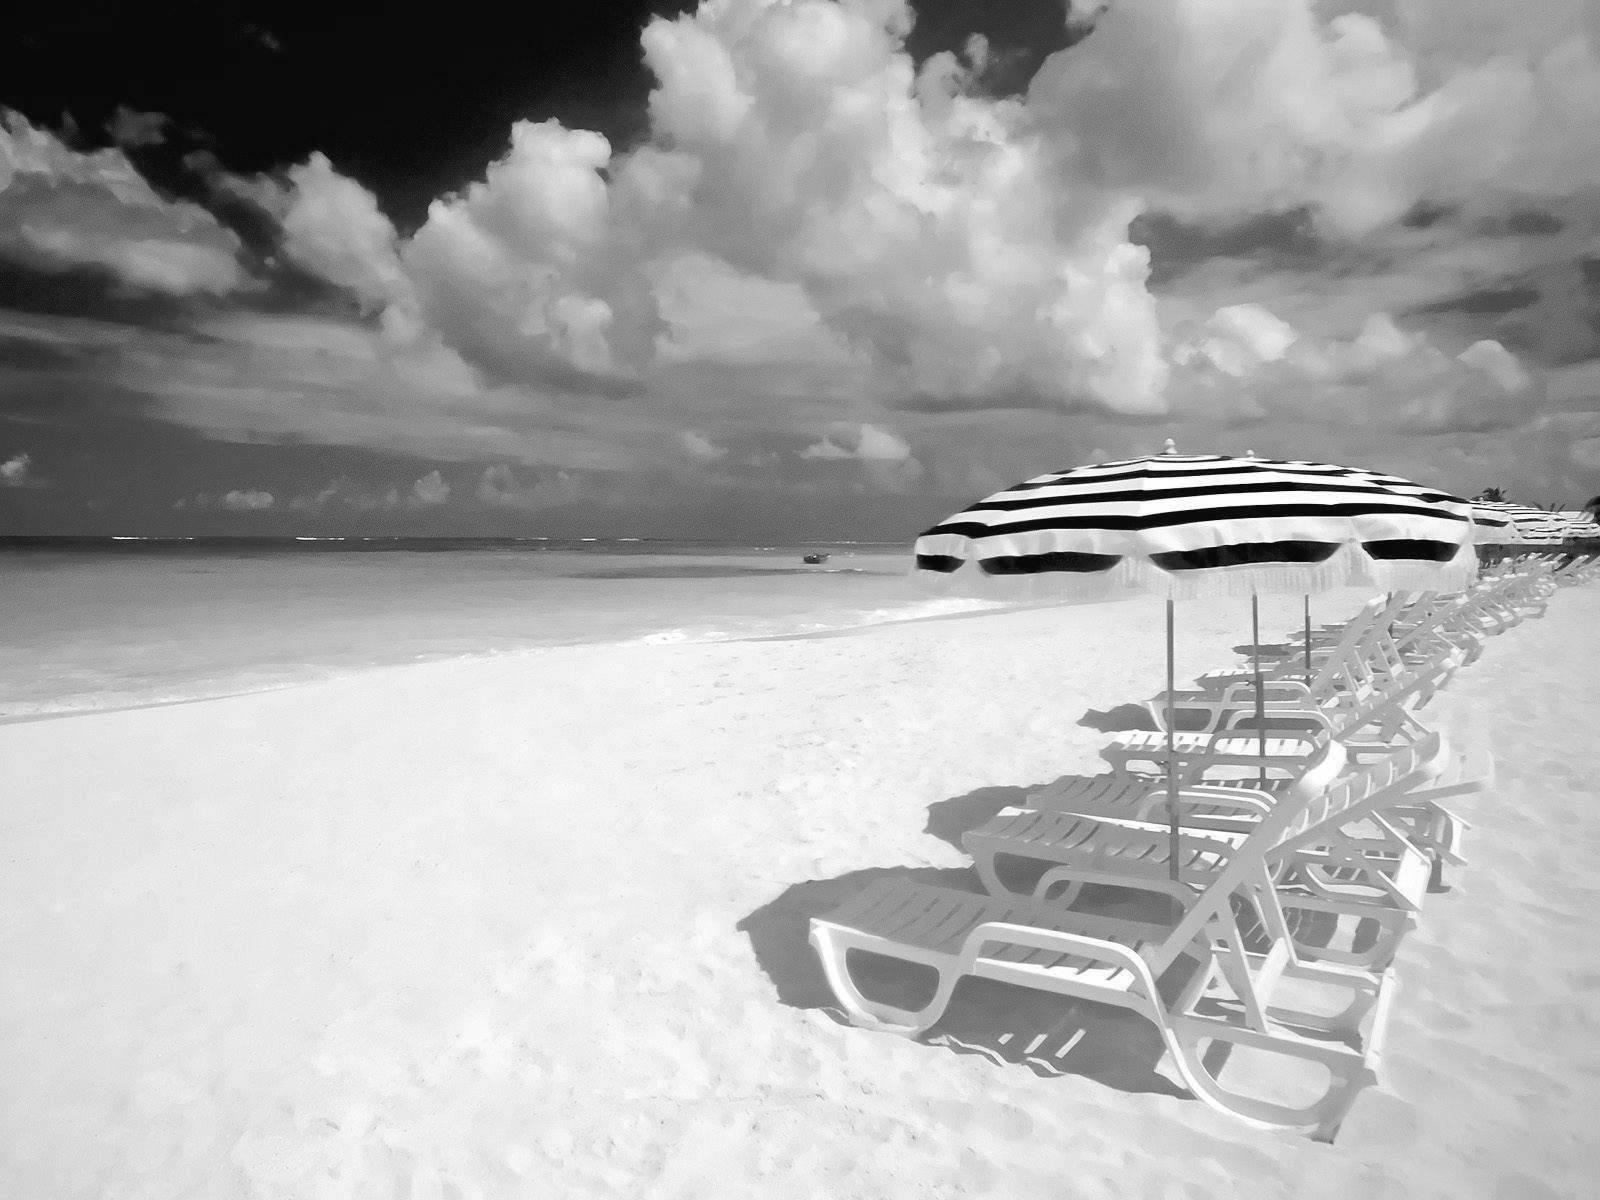 http://3.bp.blogspot.com/-hpz3uMykEuI/UMTz6Q0dD8I/AAAAAAAABuQ/YskAj_HjjsQ/s1600/Black+and+White+Beach+Landscape+Wallpaper+HD+%252819%2529.jpg